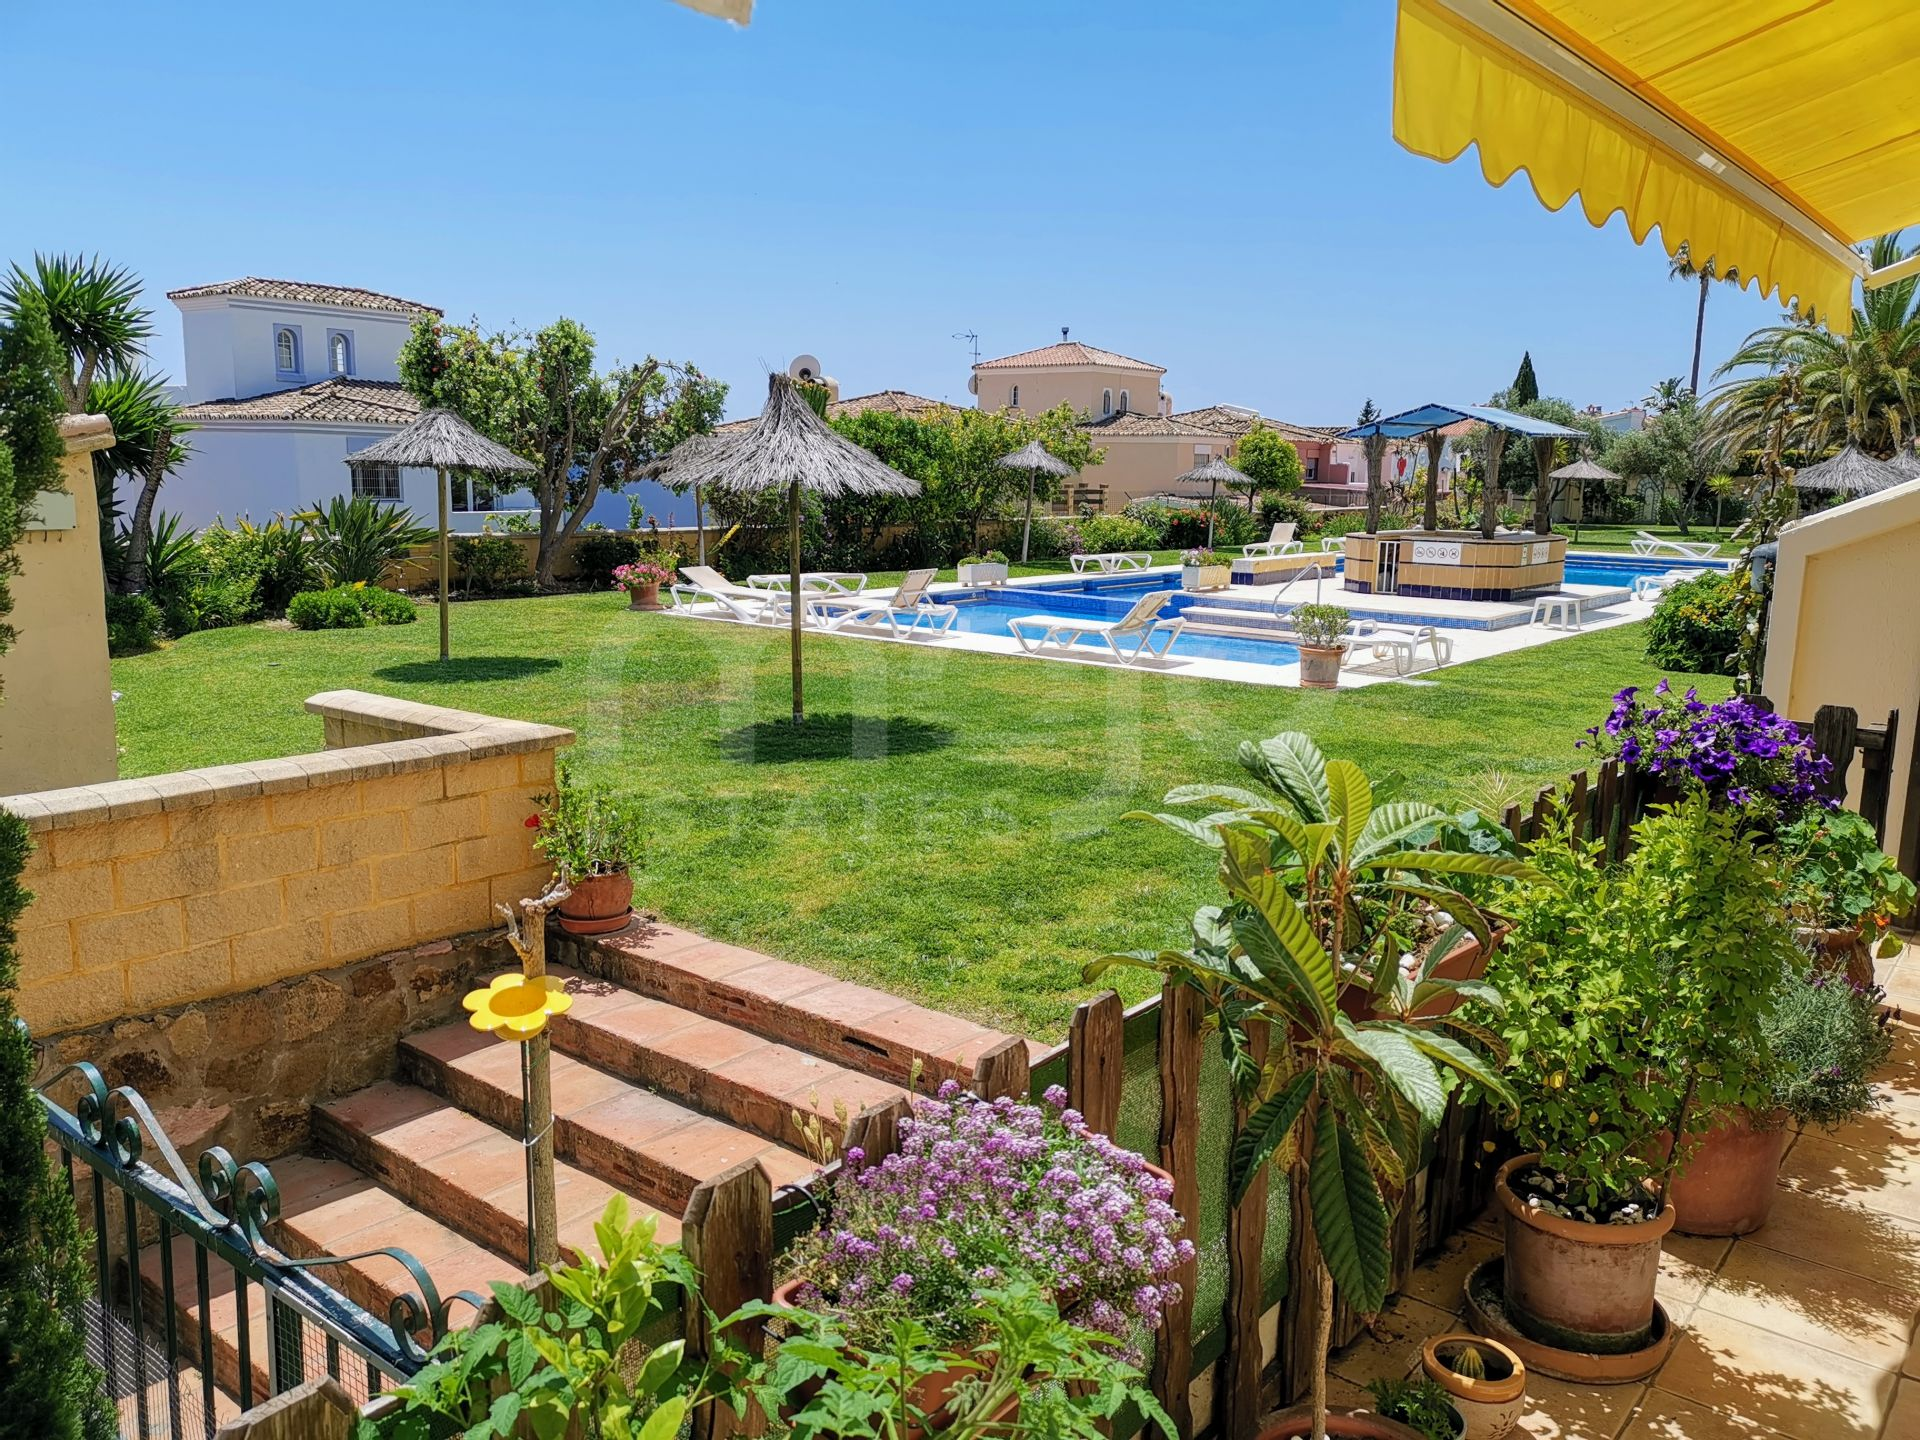 Appartement begane grond te koop in Hacienda Guadalupe, Manilva